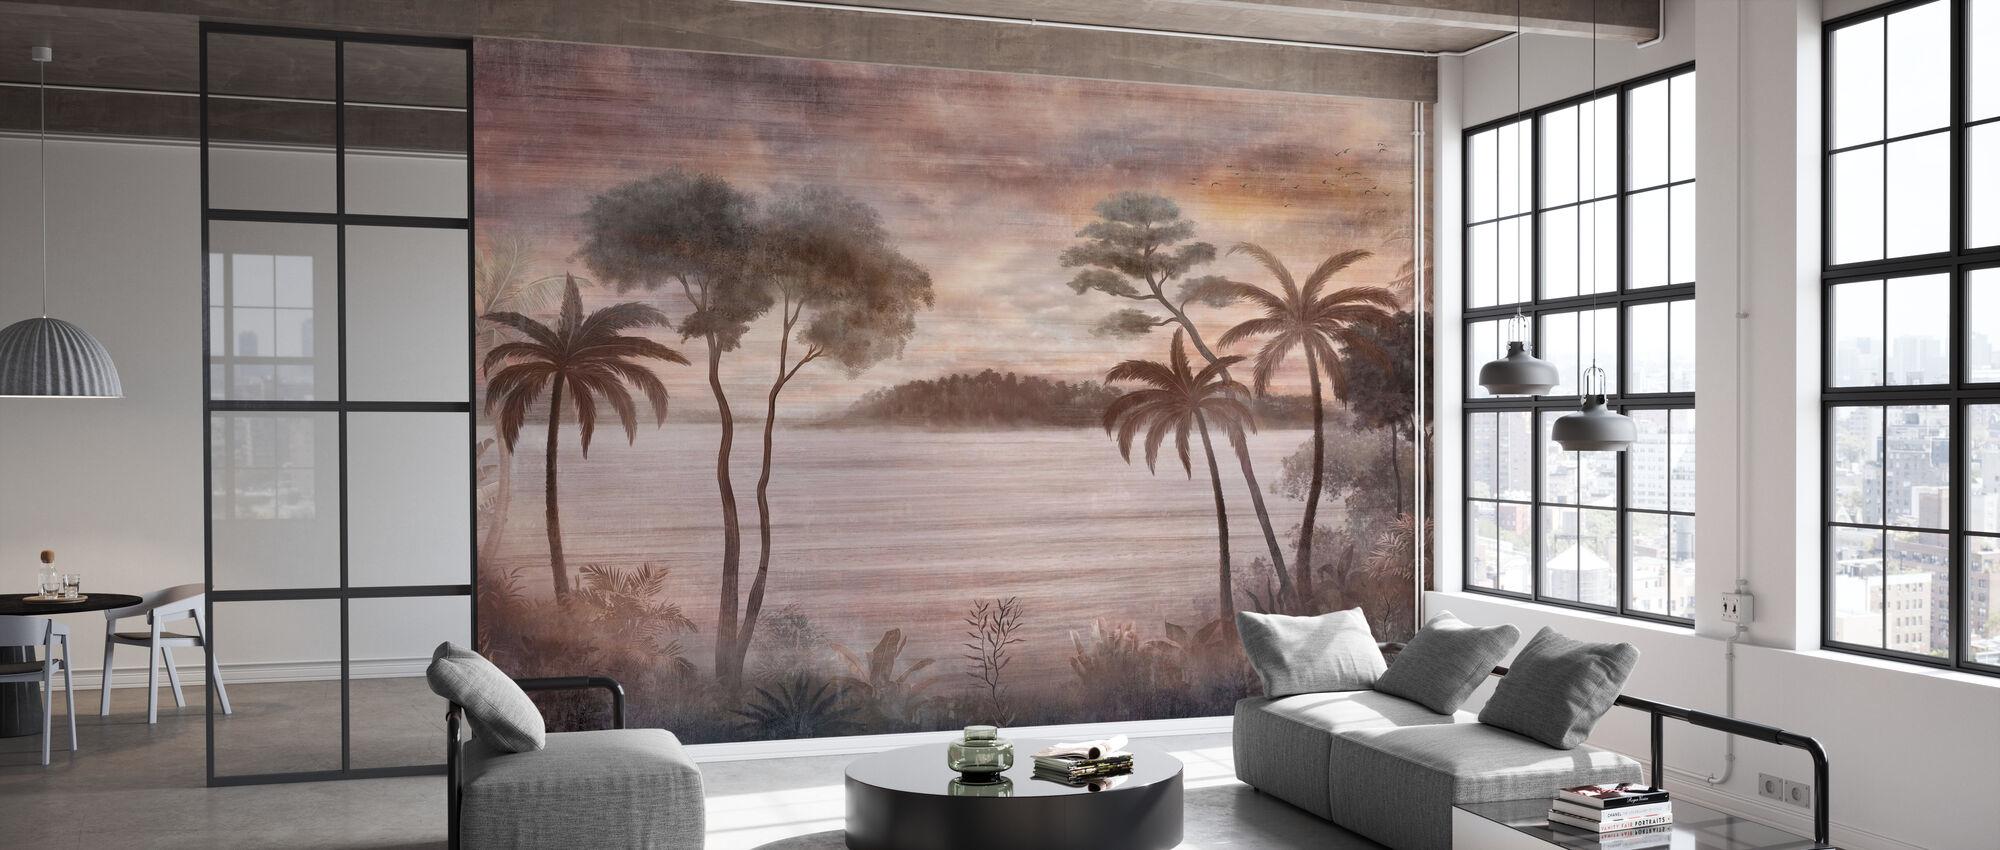 Tropical Misty Lake - Wallpaper - Office